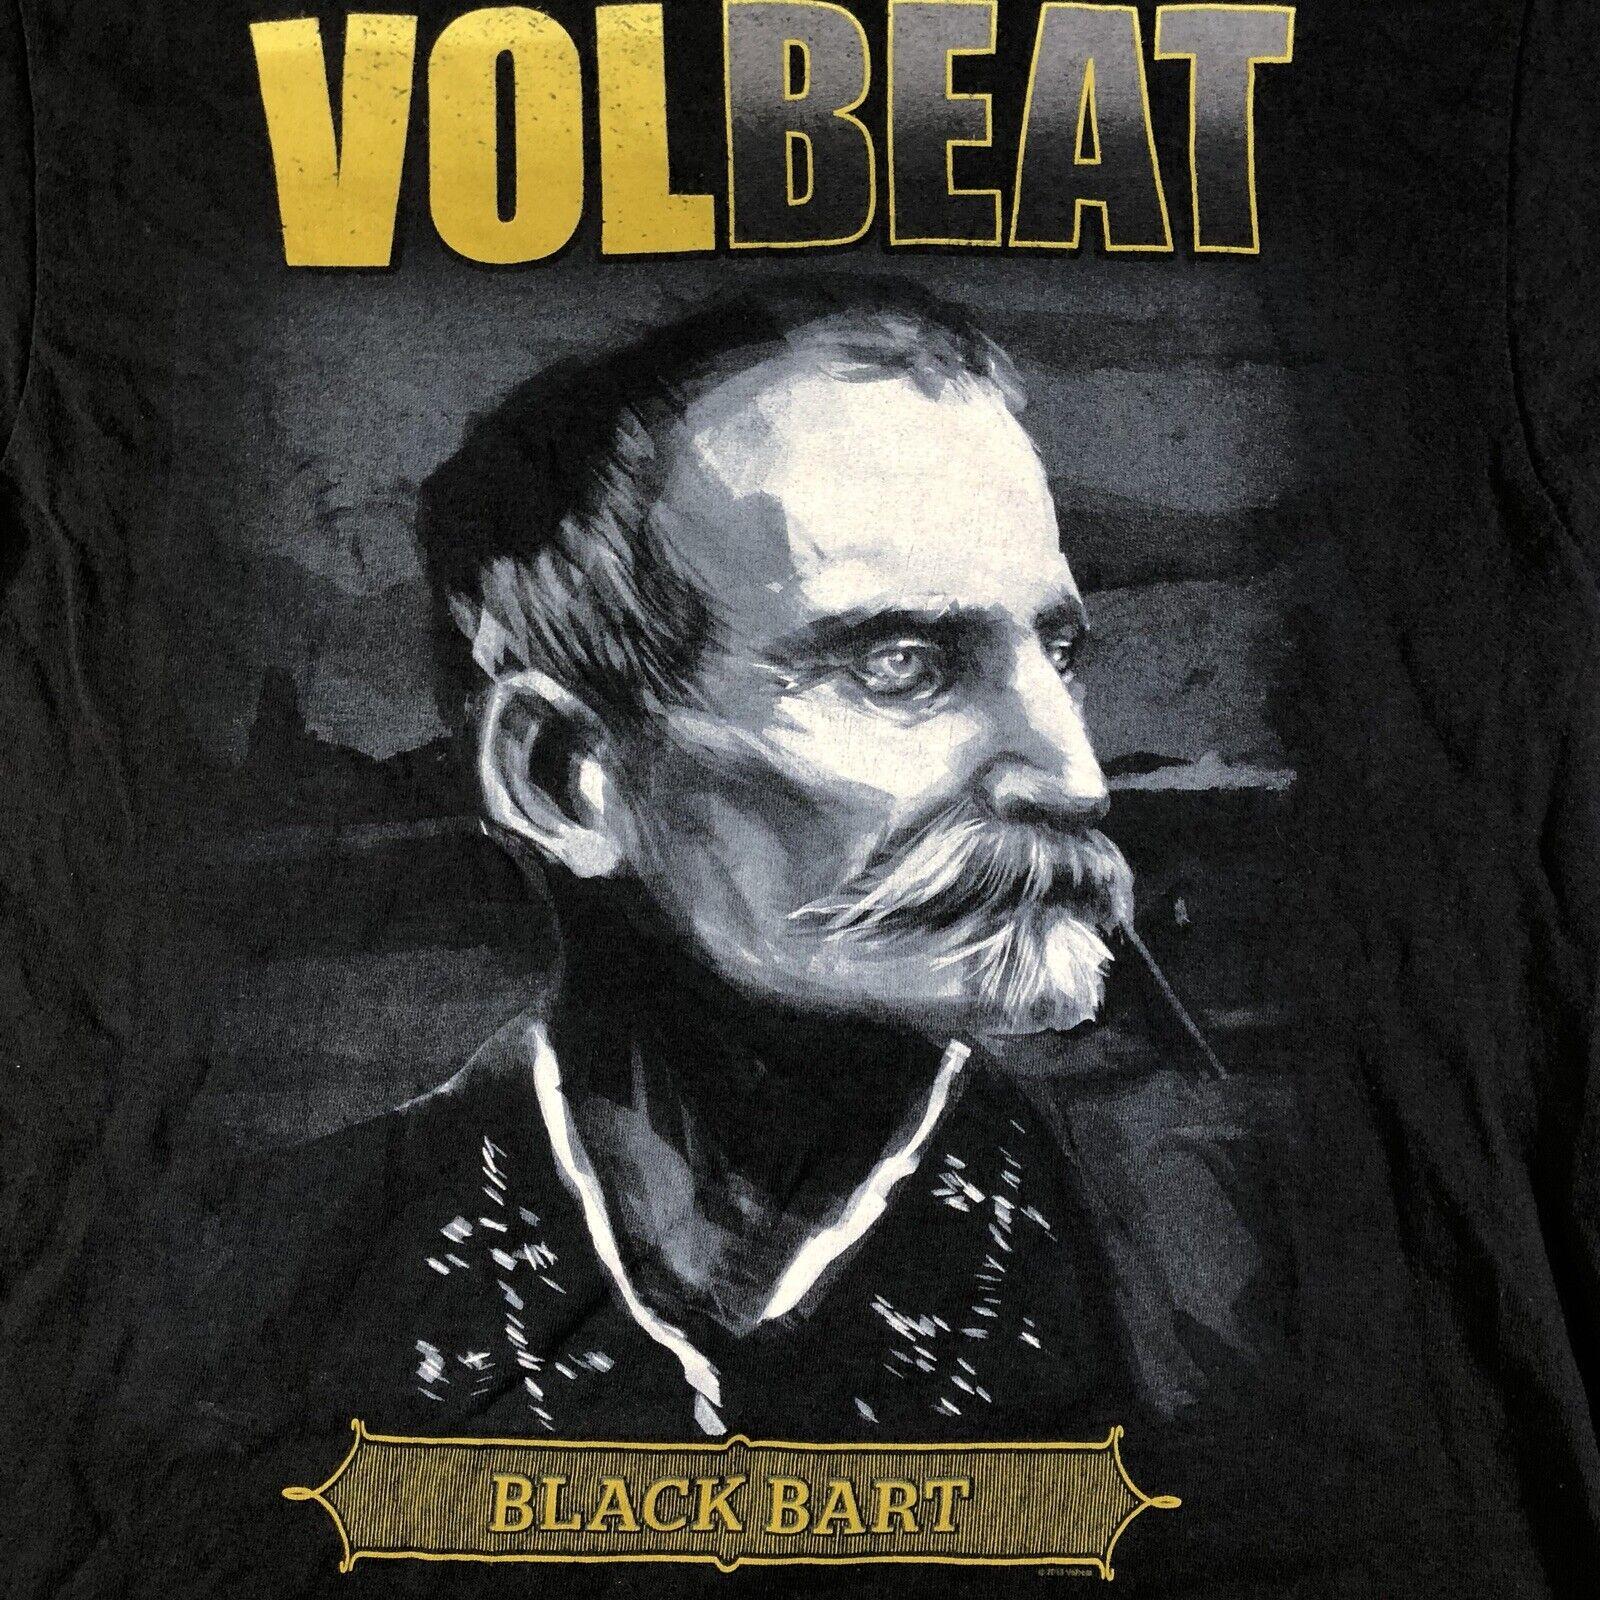 Volbeat Black Bart Outlaw Cowboy Rock Band 2013 T… - image 3